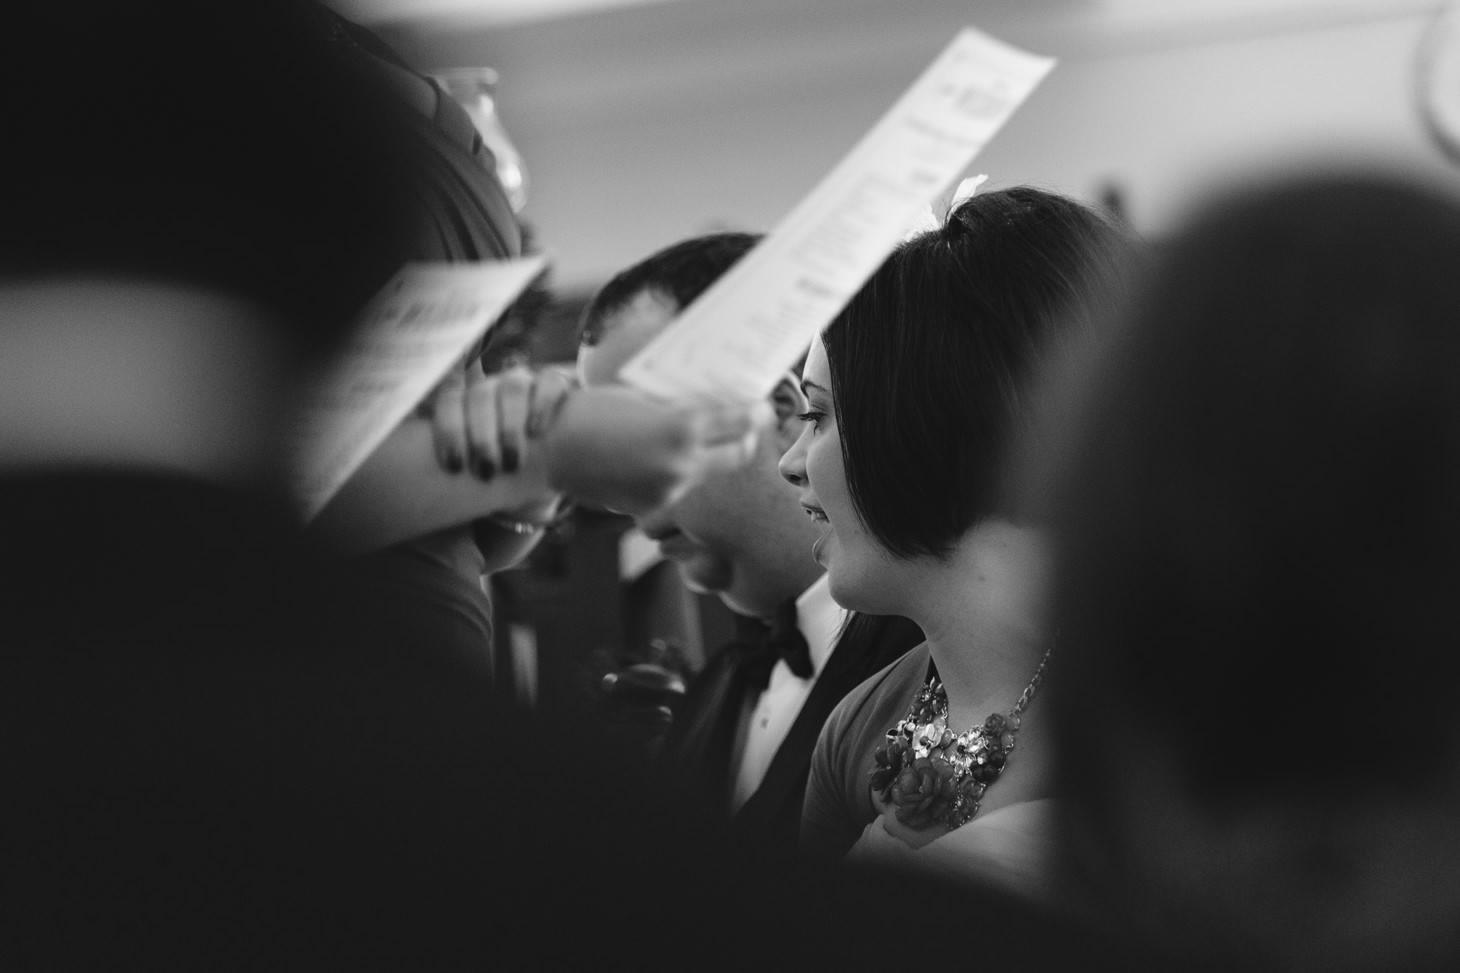 020-nyc-wedding-photographer-smitten-chickens-nj-montclair-art-museum.jpg